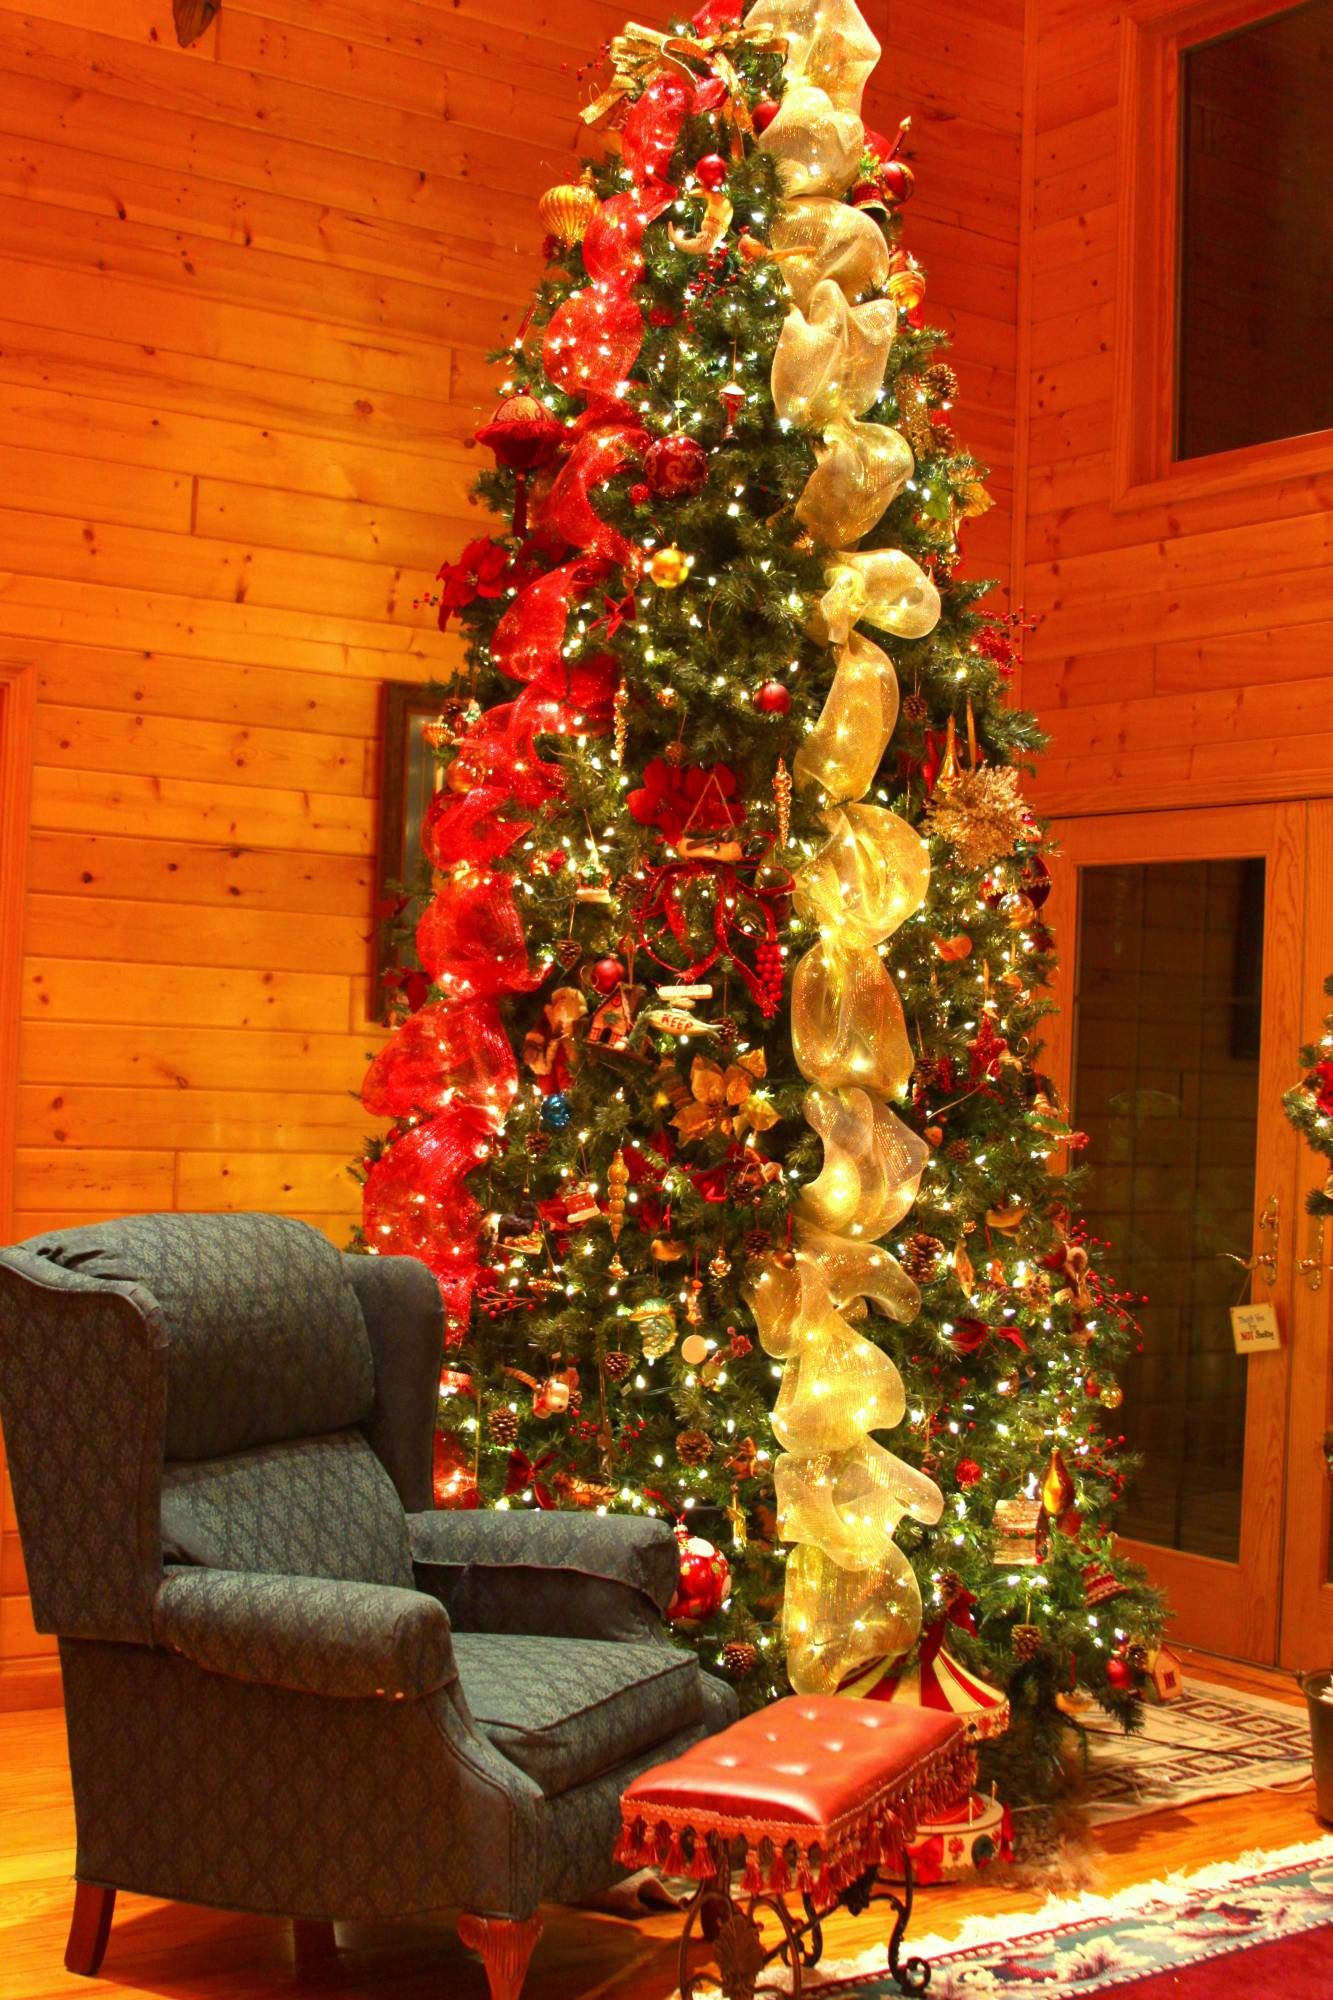 Illinois Lodge & Resort Bed & Breakfast, Lodging